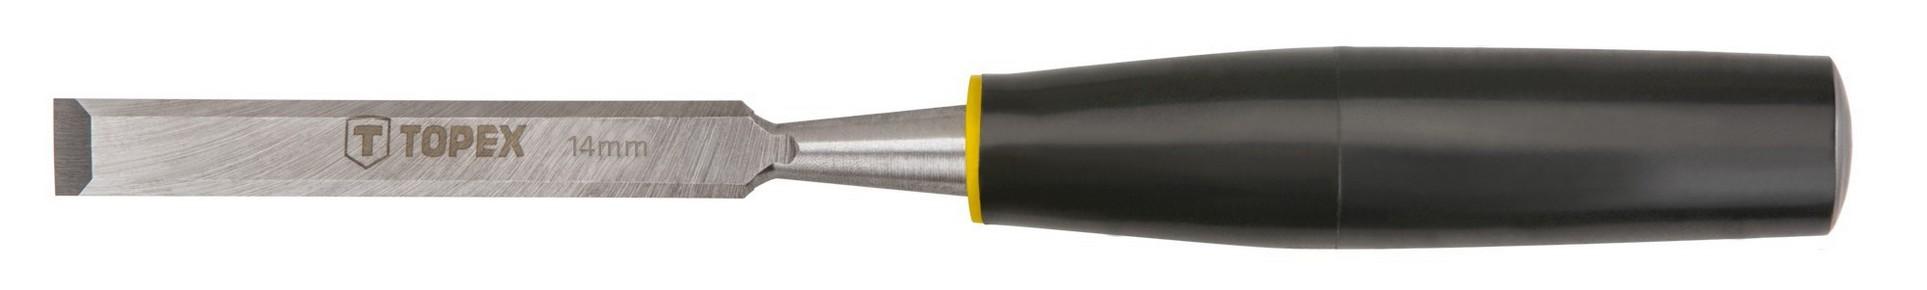 Favésõ 14 mm lapos, mûanyag nyelû | TOPEX 09A114